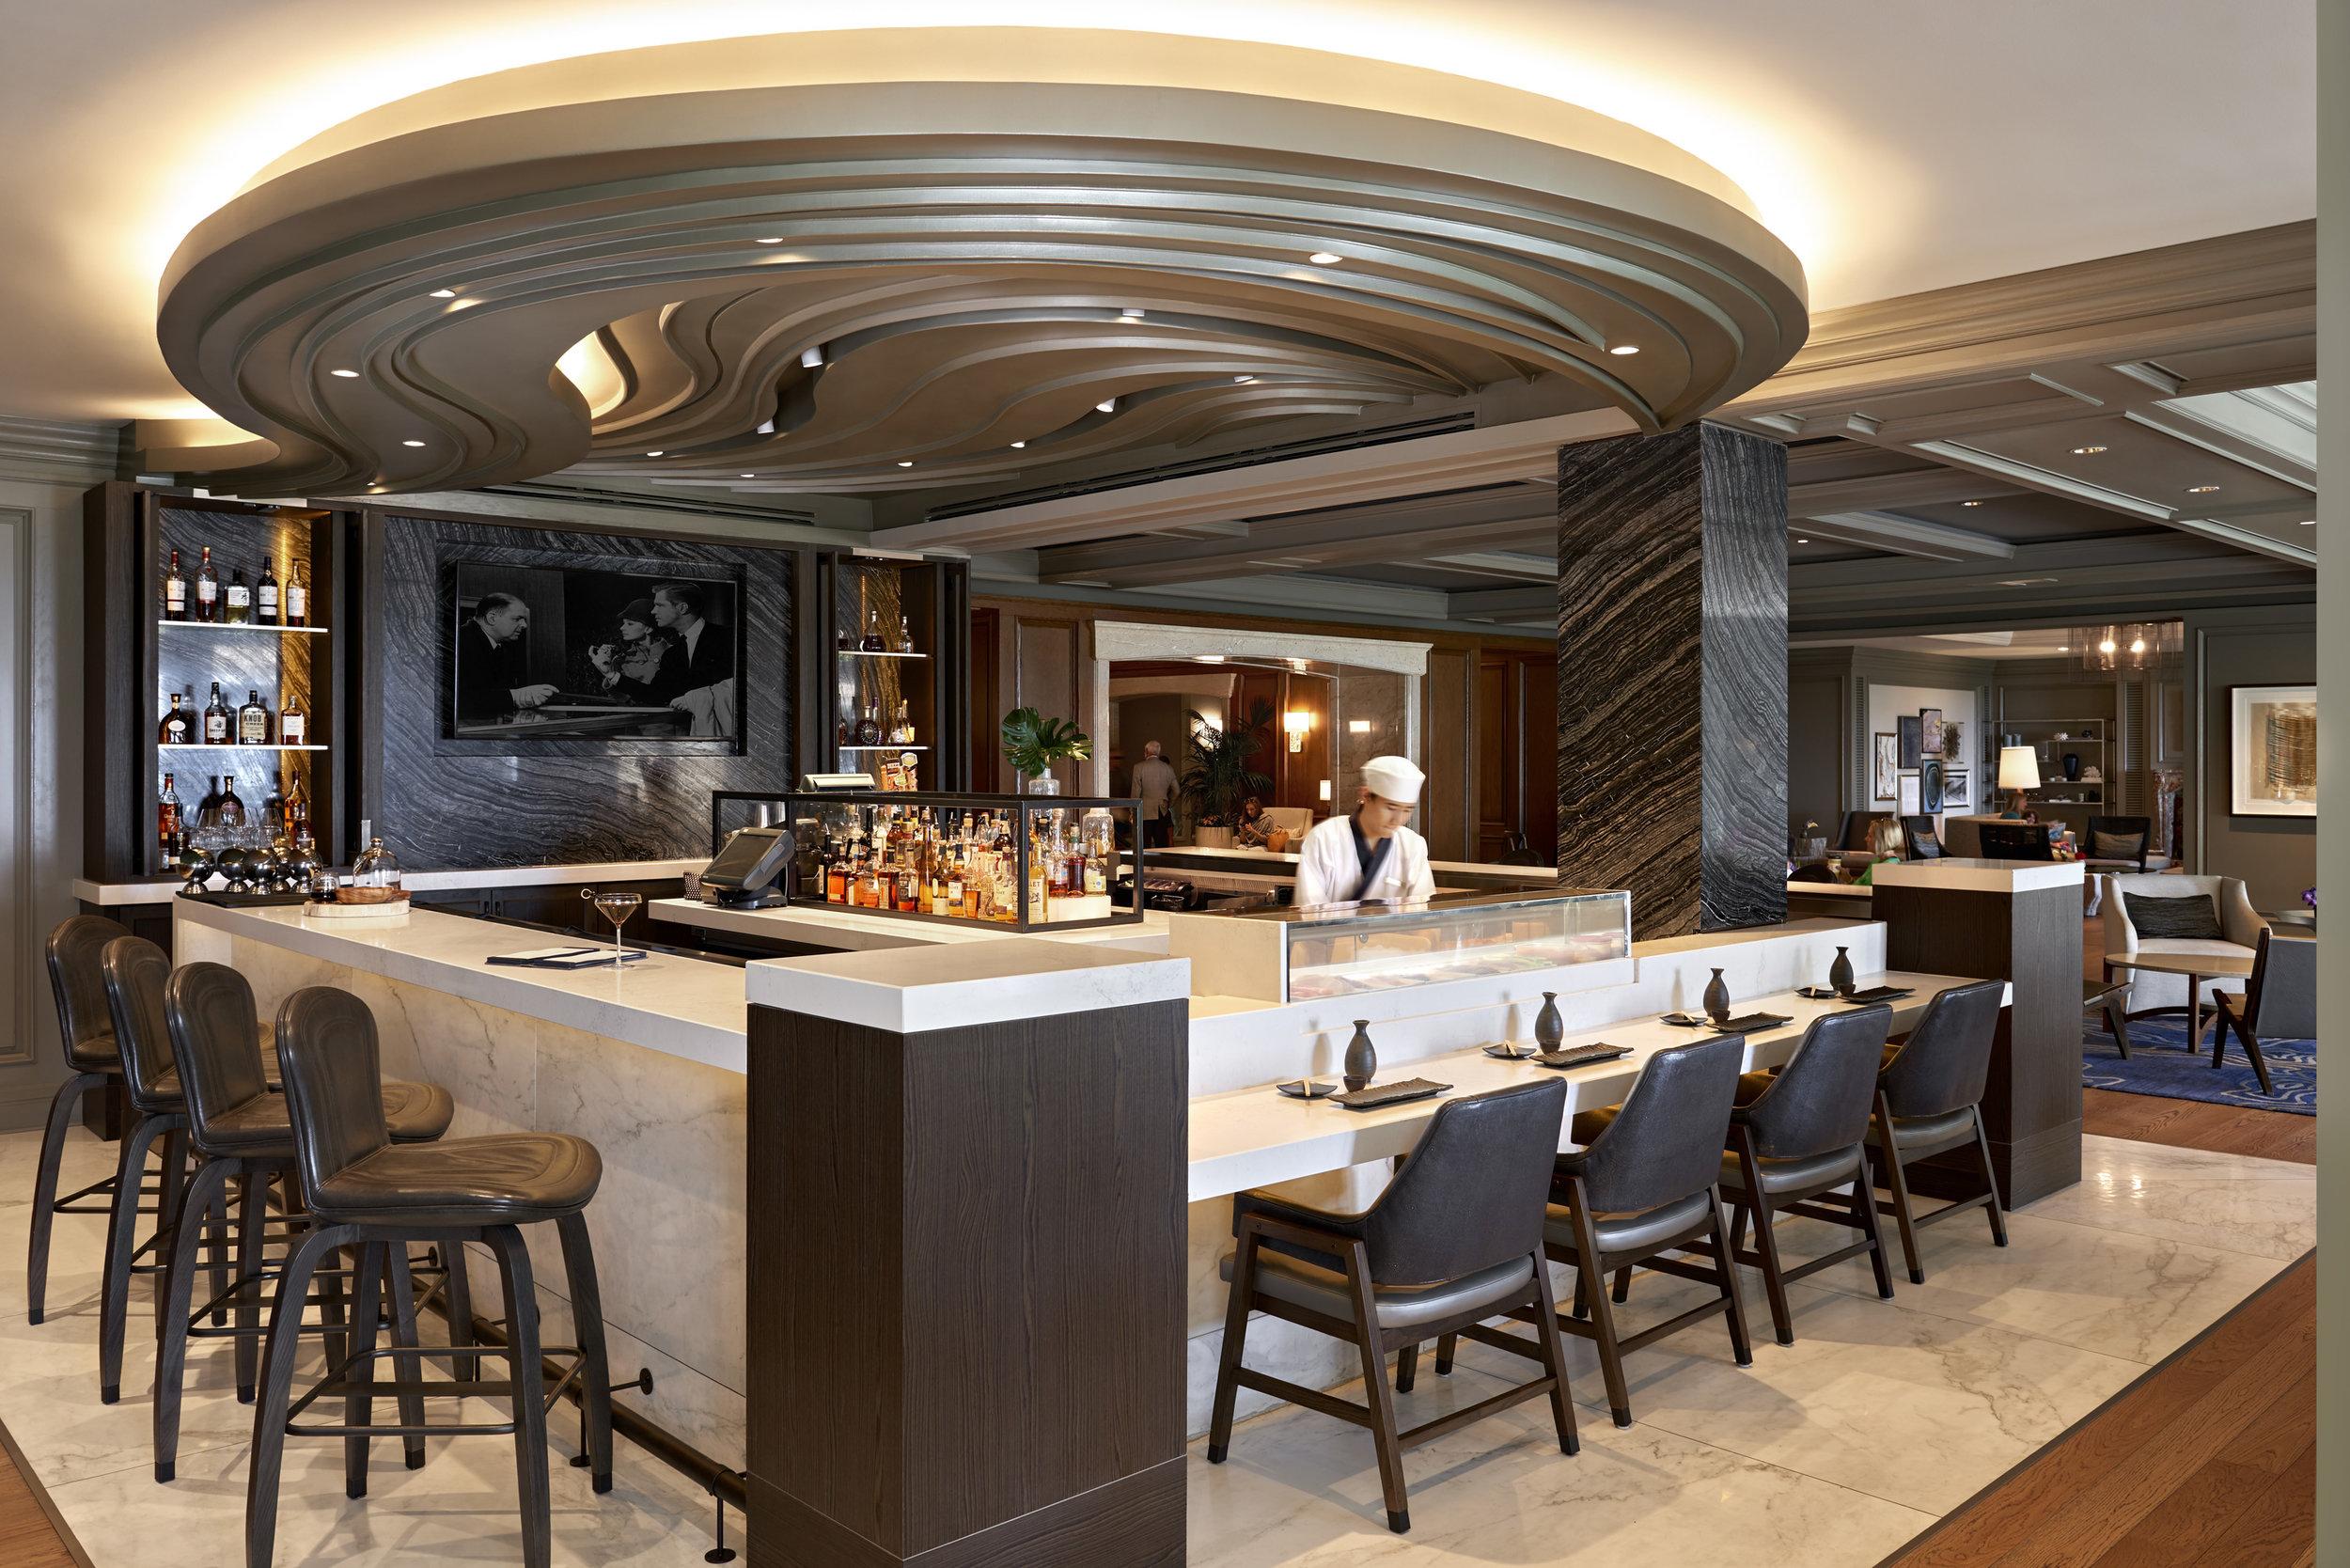 Ritz-Carlton-Amelia-Island-Shot-1-LR.jpg